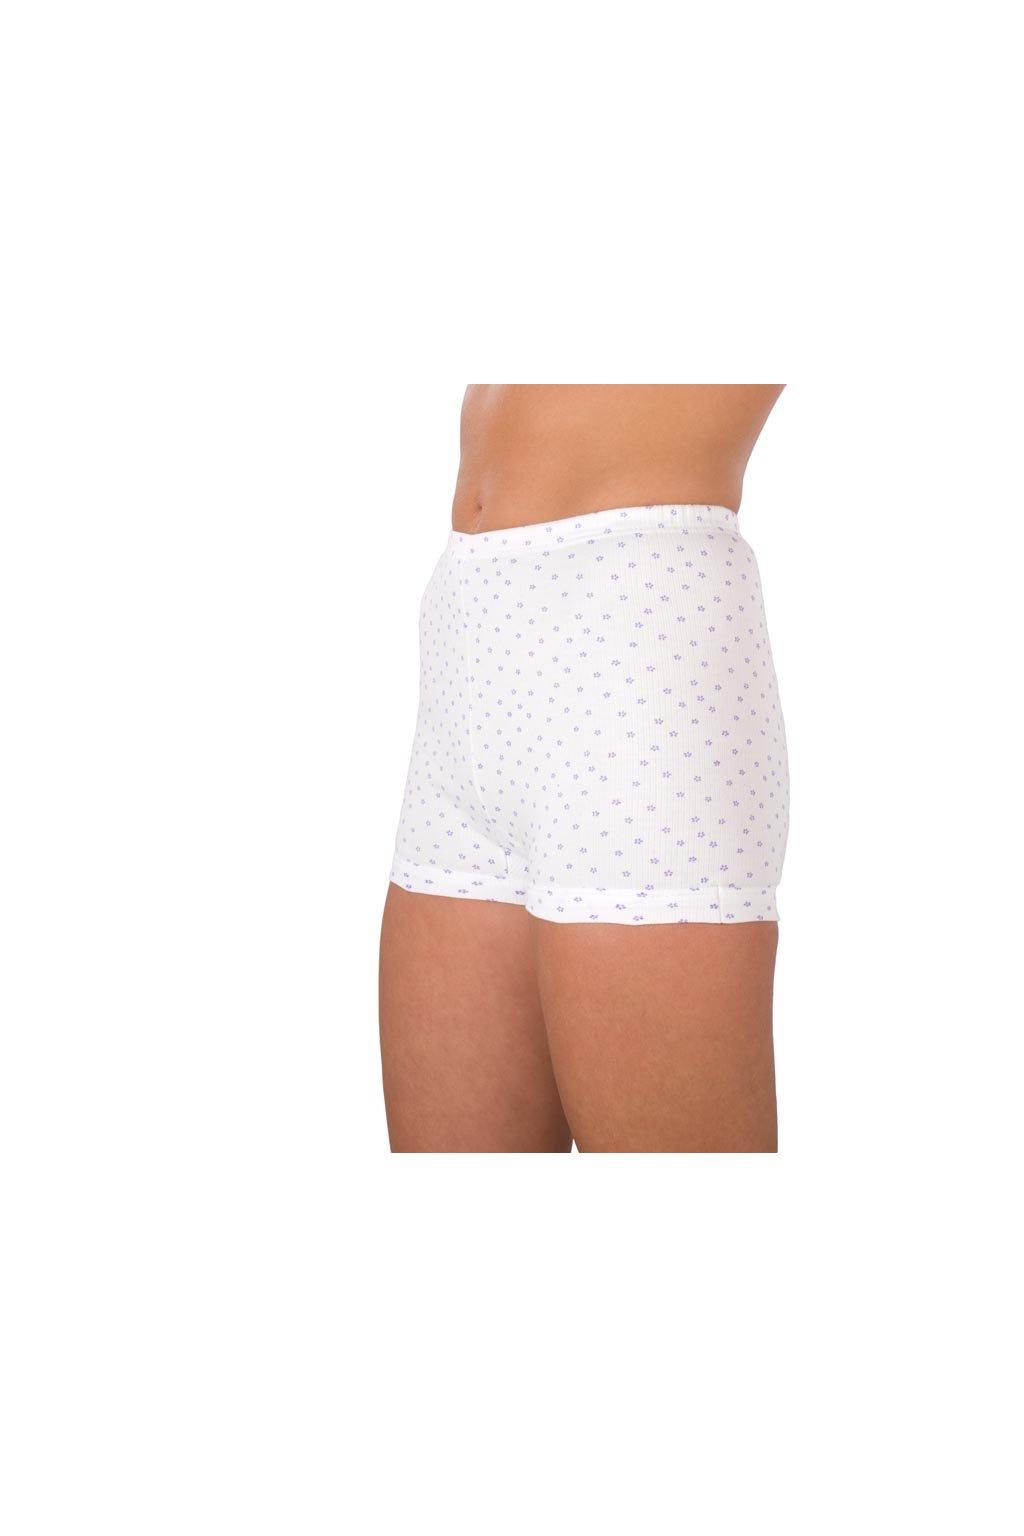 Dámské kalhotky, 100WERA 1, bílá